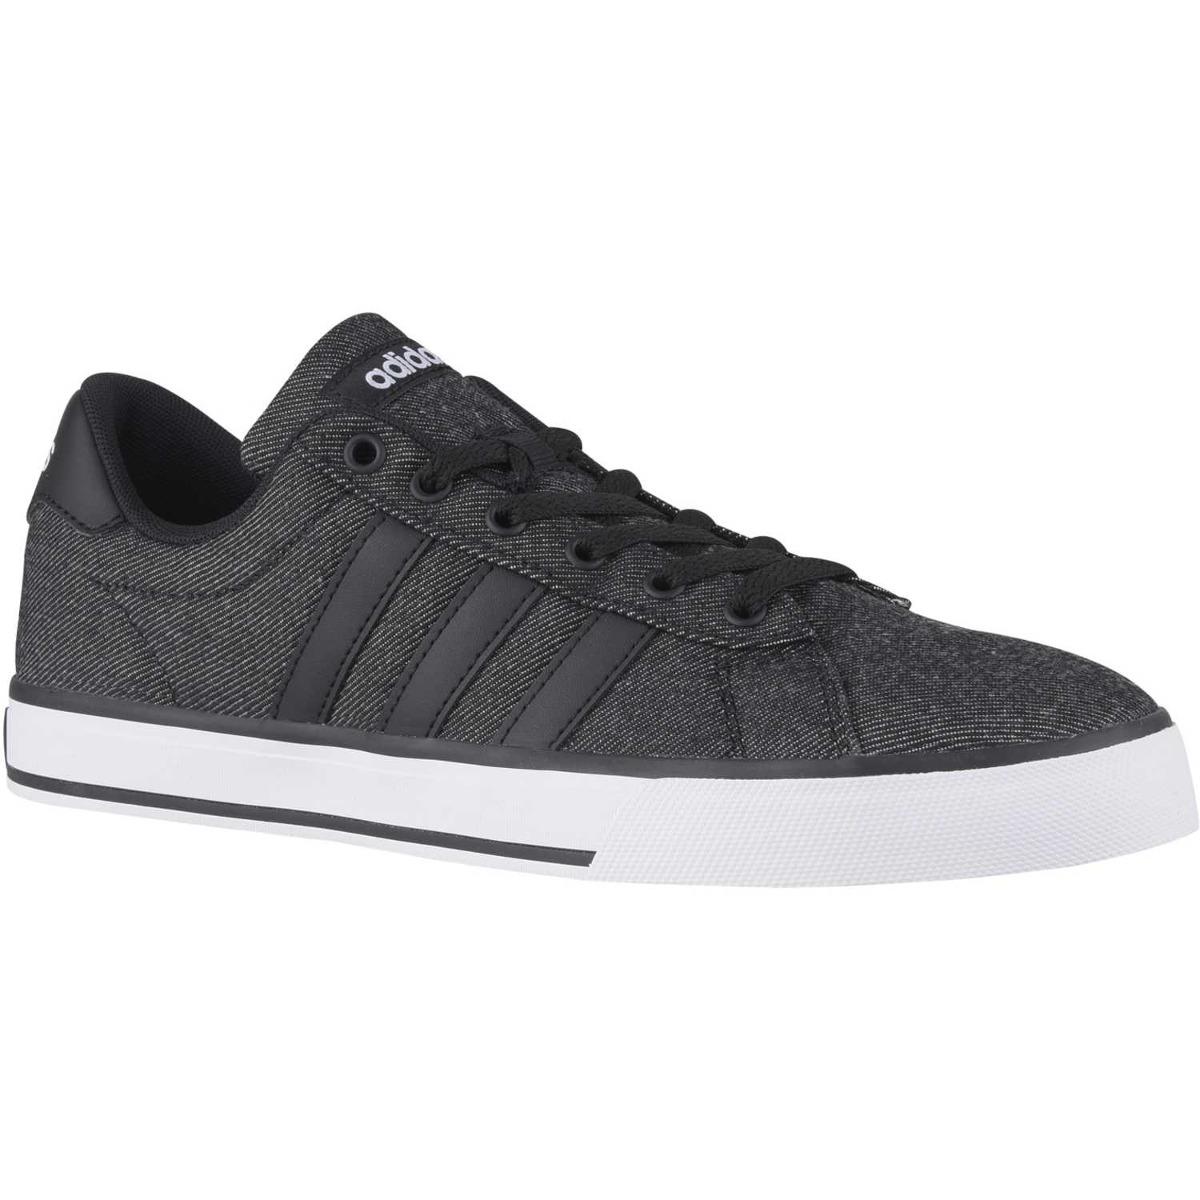 Adidas NEO Daily Vulc Nuevos Modelos